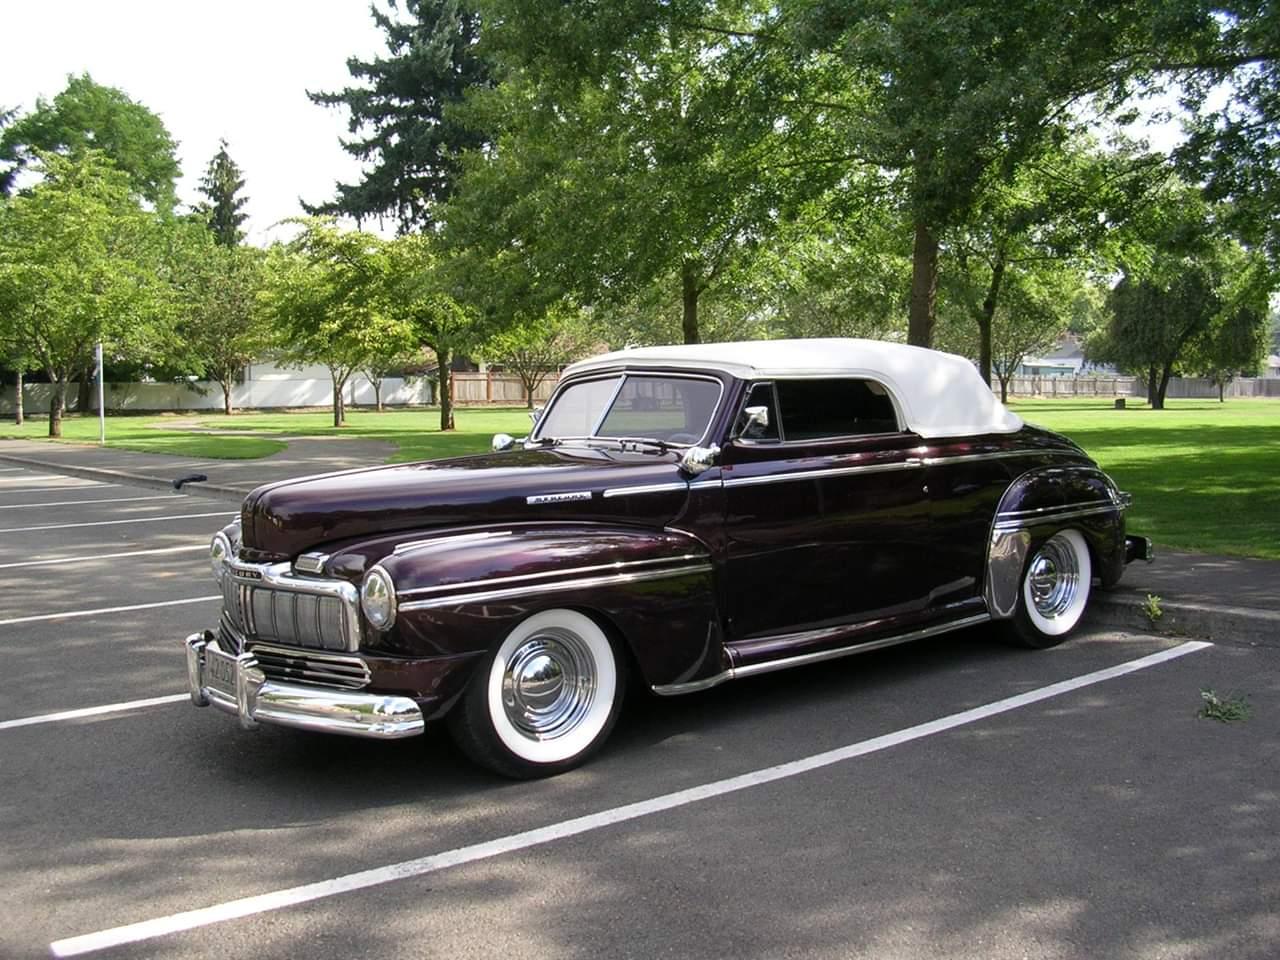 1946 Mercury Convertible https://t.co/DvAJfjwPNr